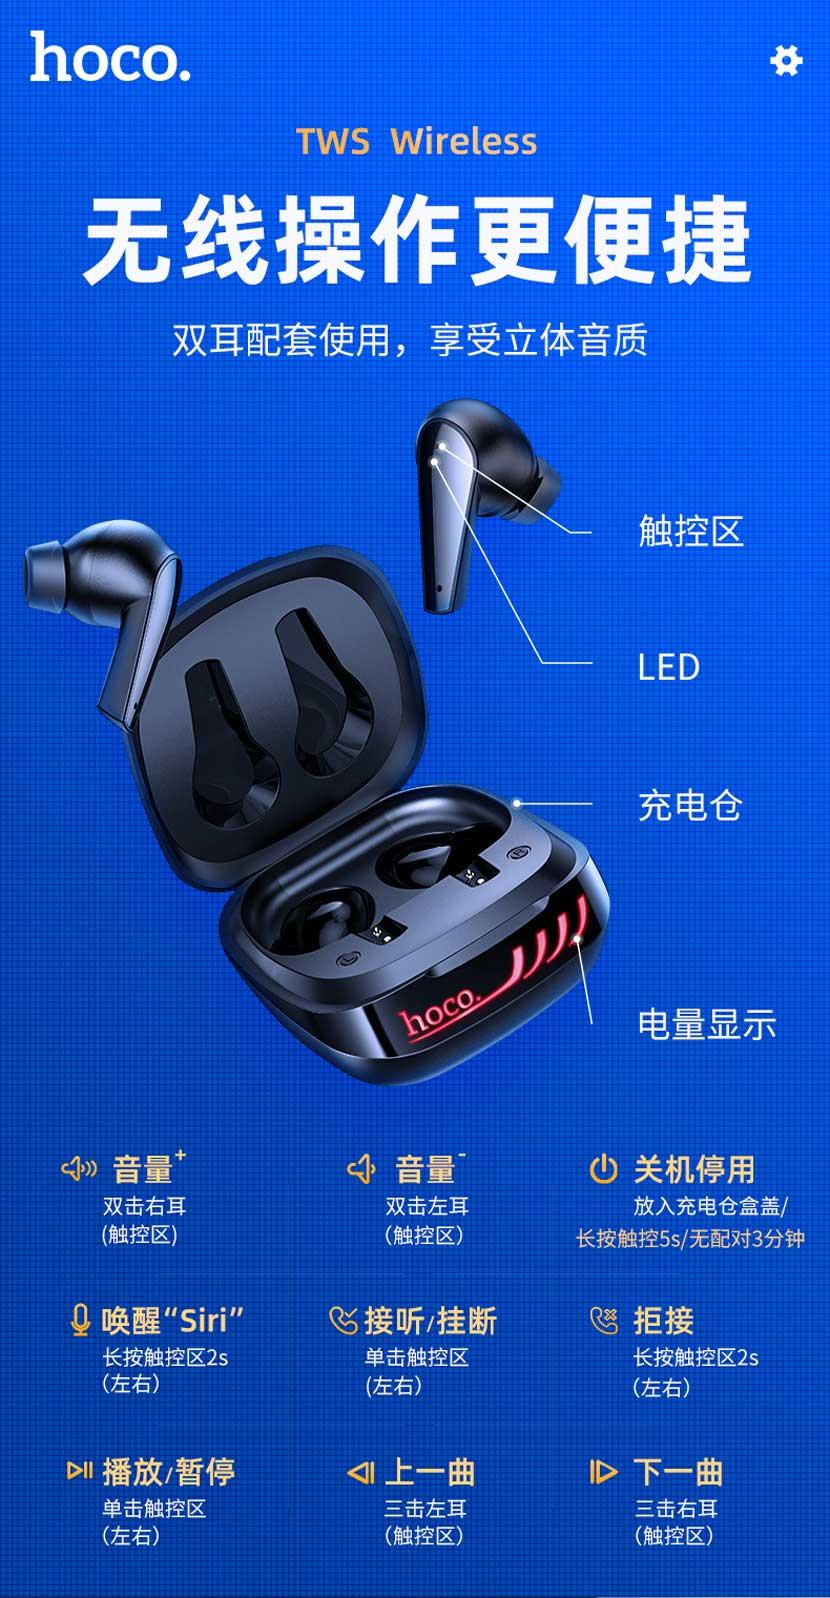 hoco news es43 lucky sound tws wireless headset operation cn